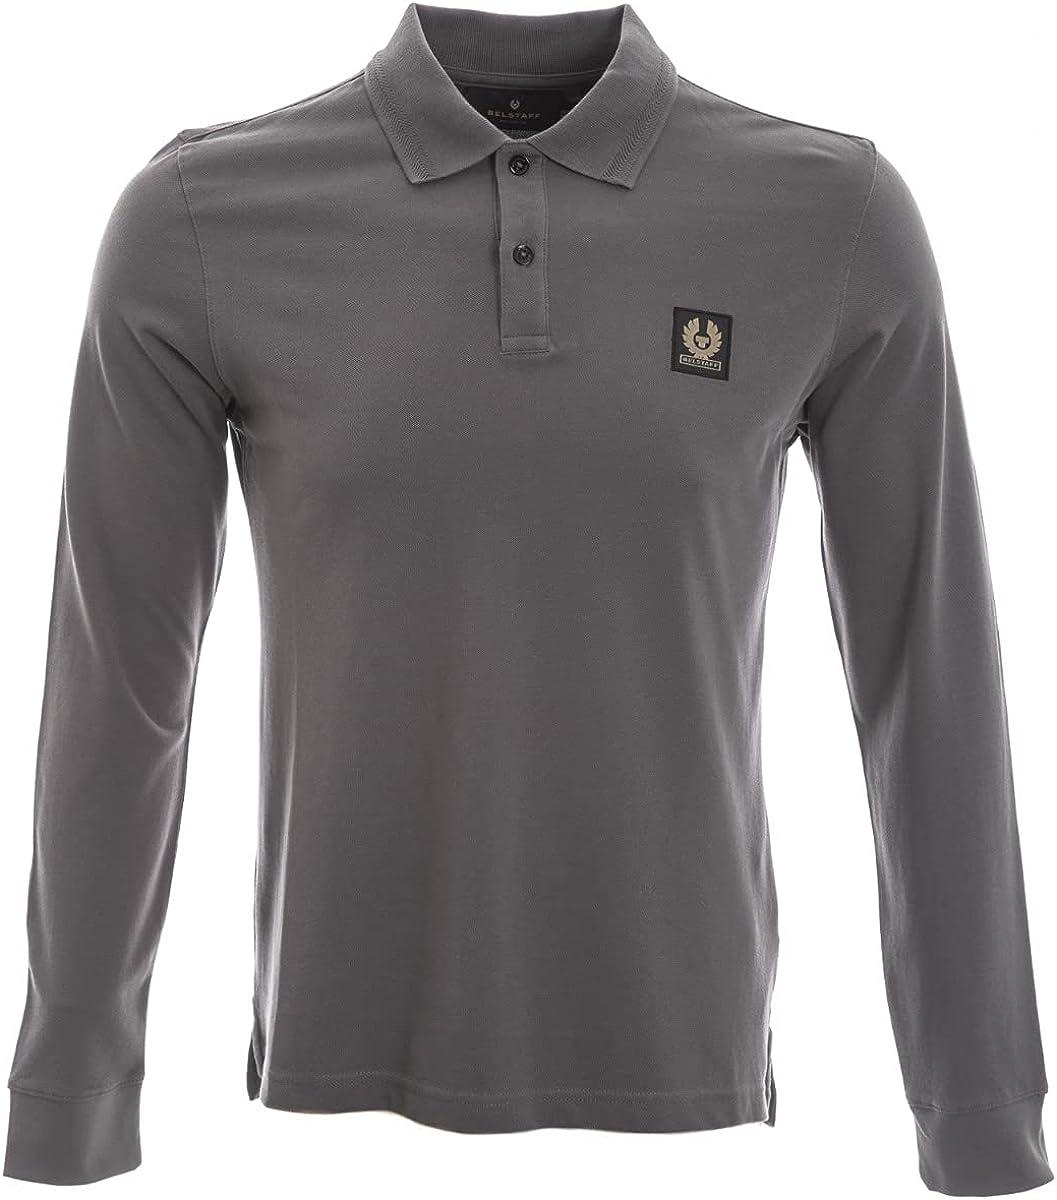 Belstaff Classic Long Sleeve Polo Shirt in Granite Grey